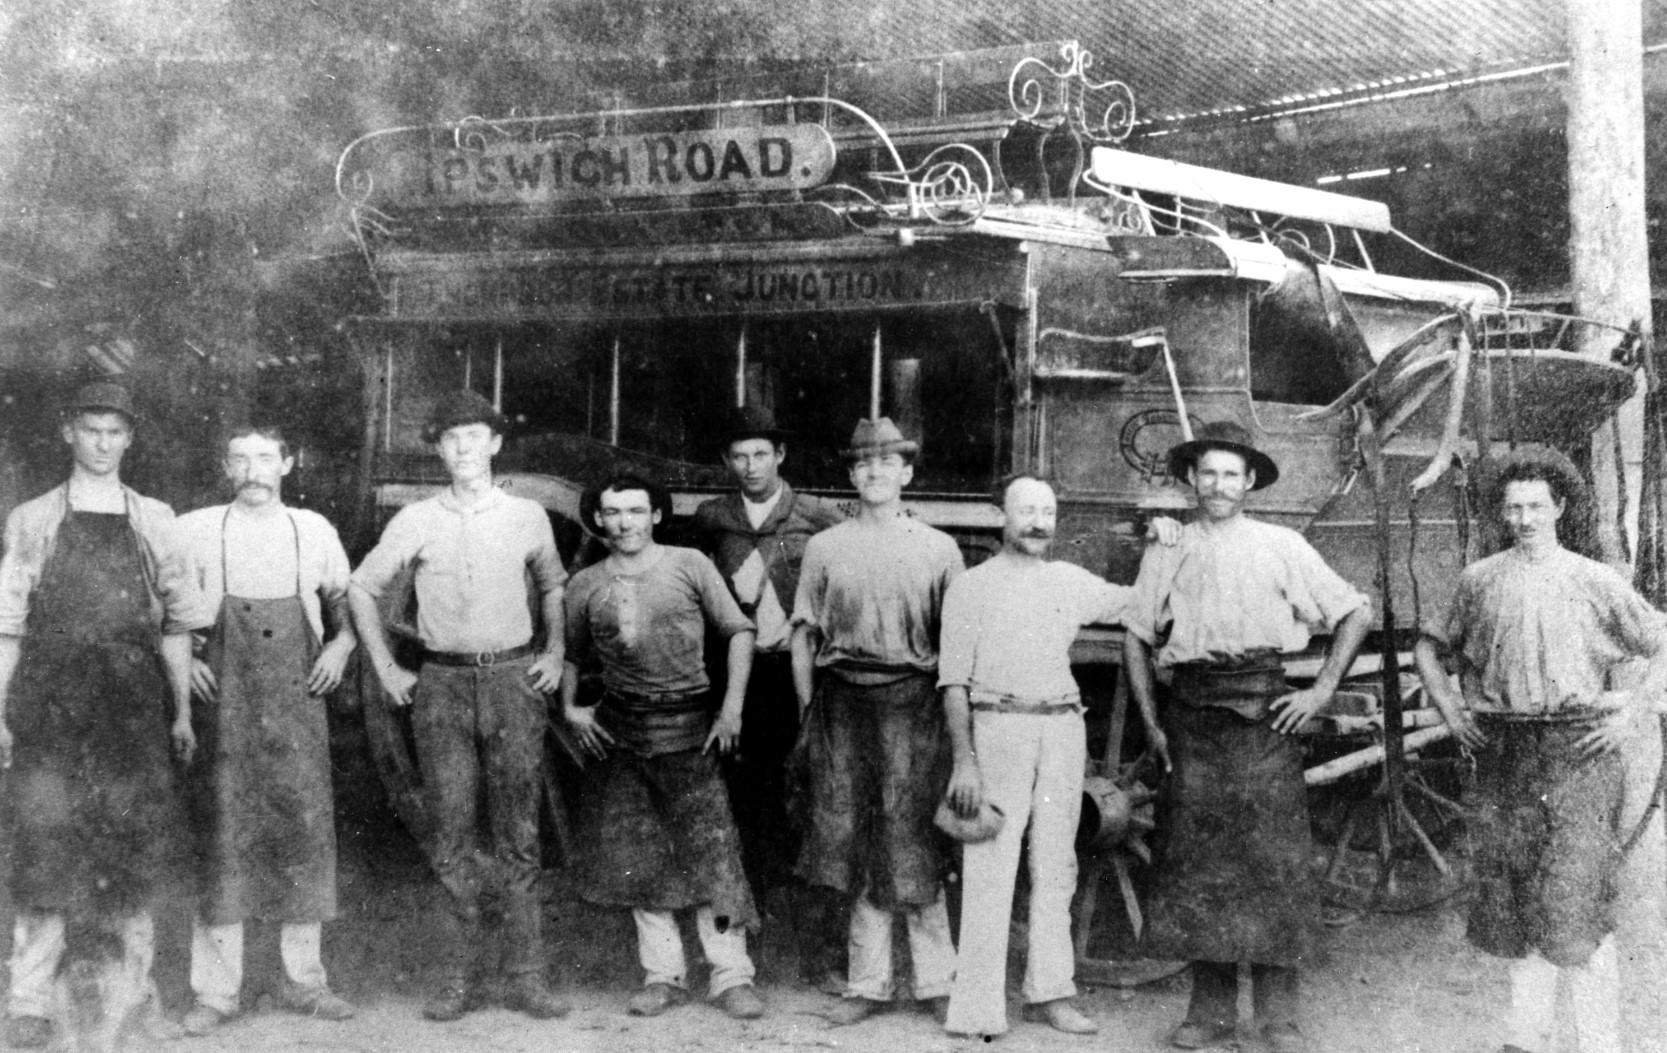 Workmen in front of a horsedrawn bus, in a transport depot, Brisbane, ca 1895 slq